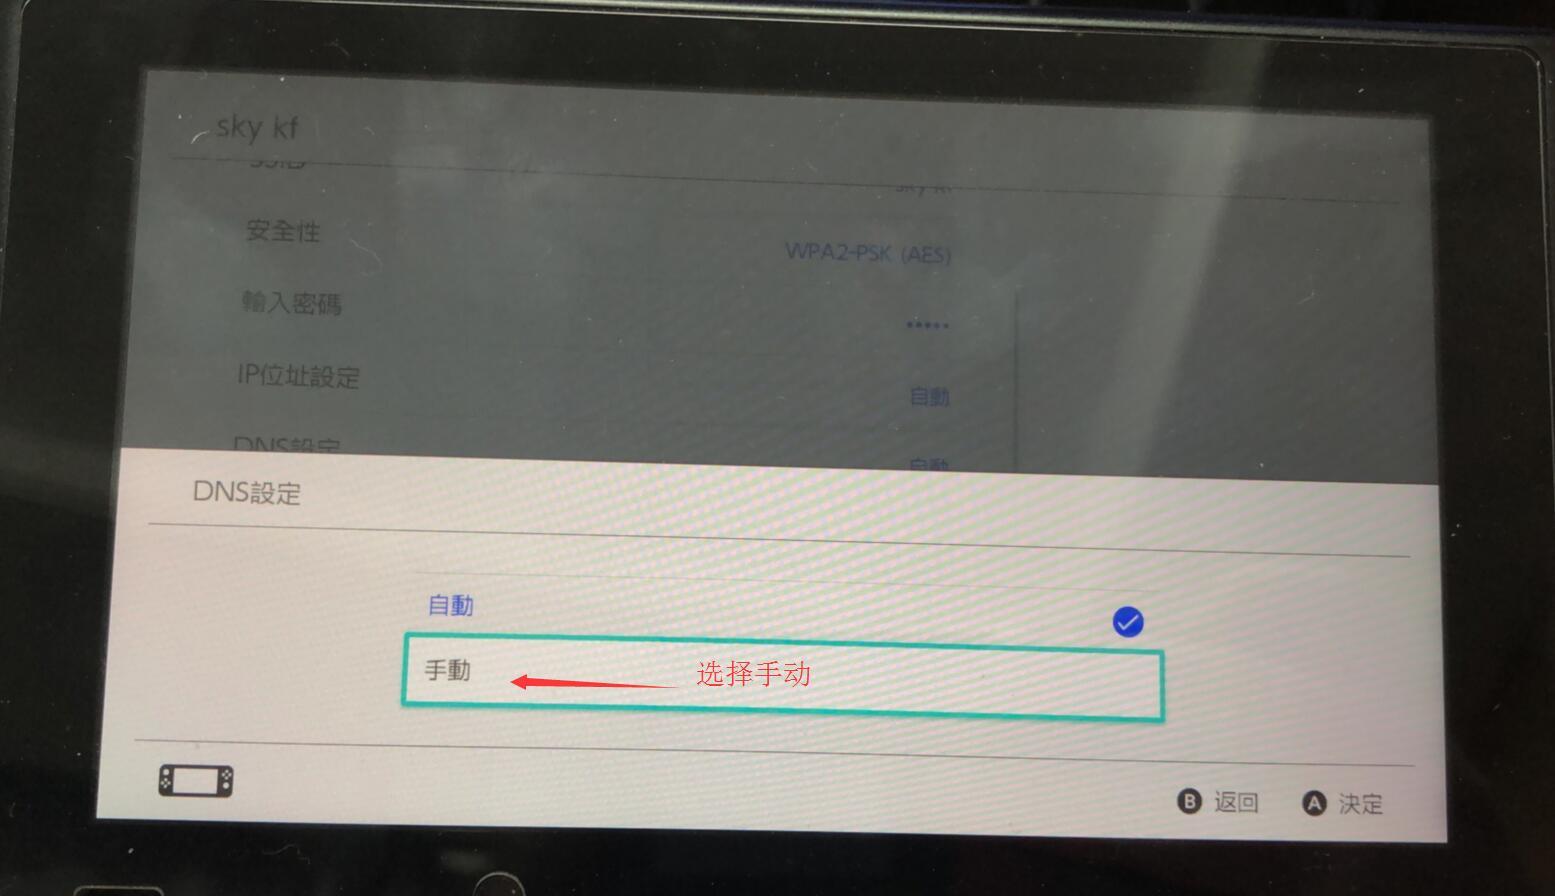 NS SWITCH 【DNS修改教程】